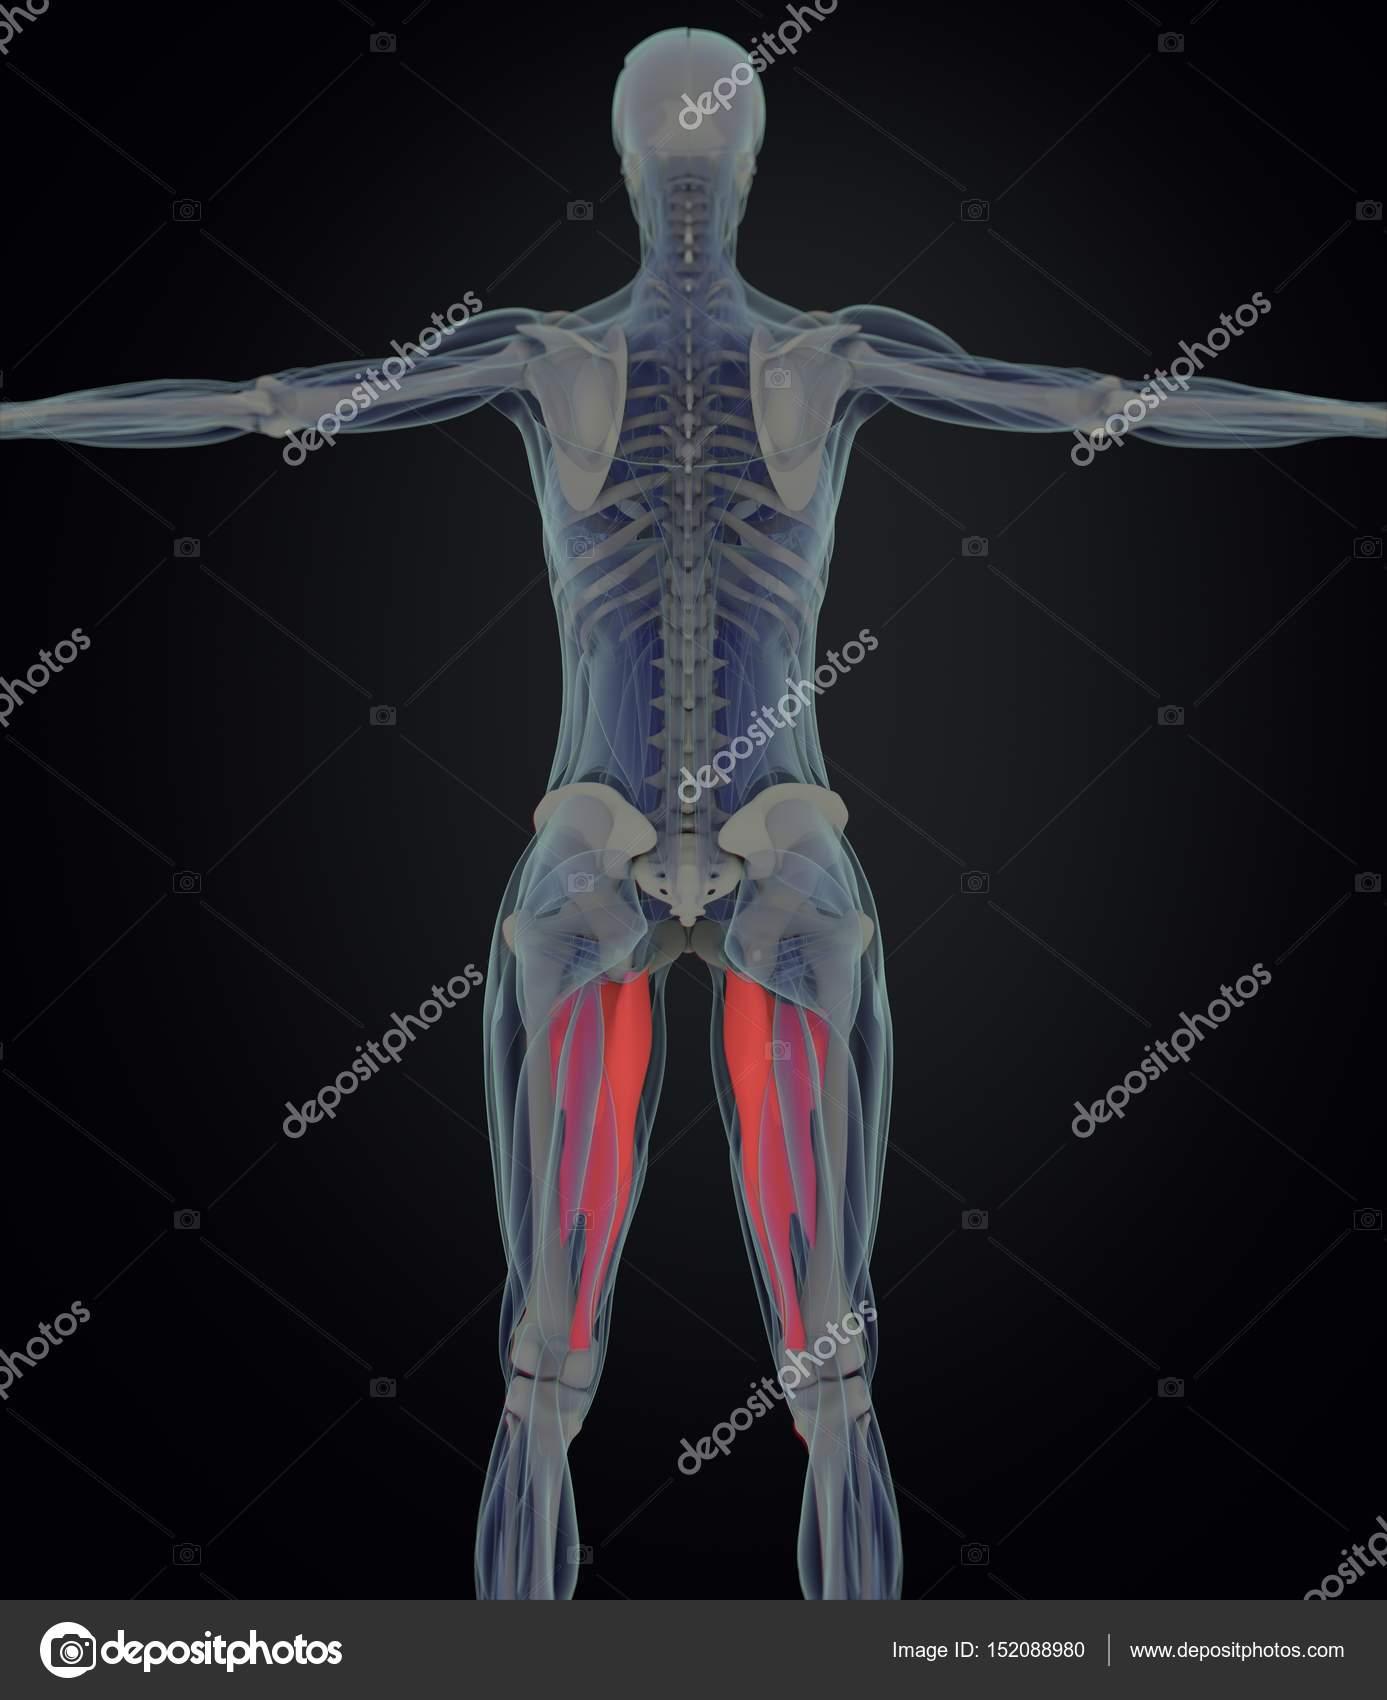 adductor Muscles anatomy model — Stock Photo © AnatomyInsider #152088980